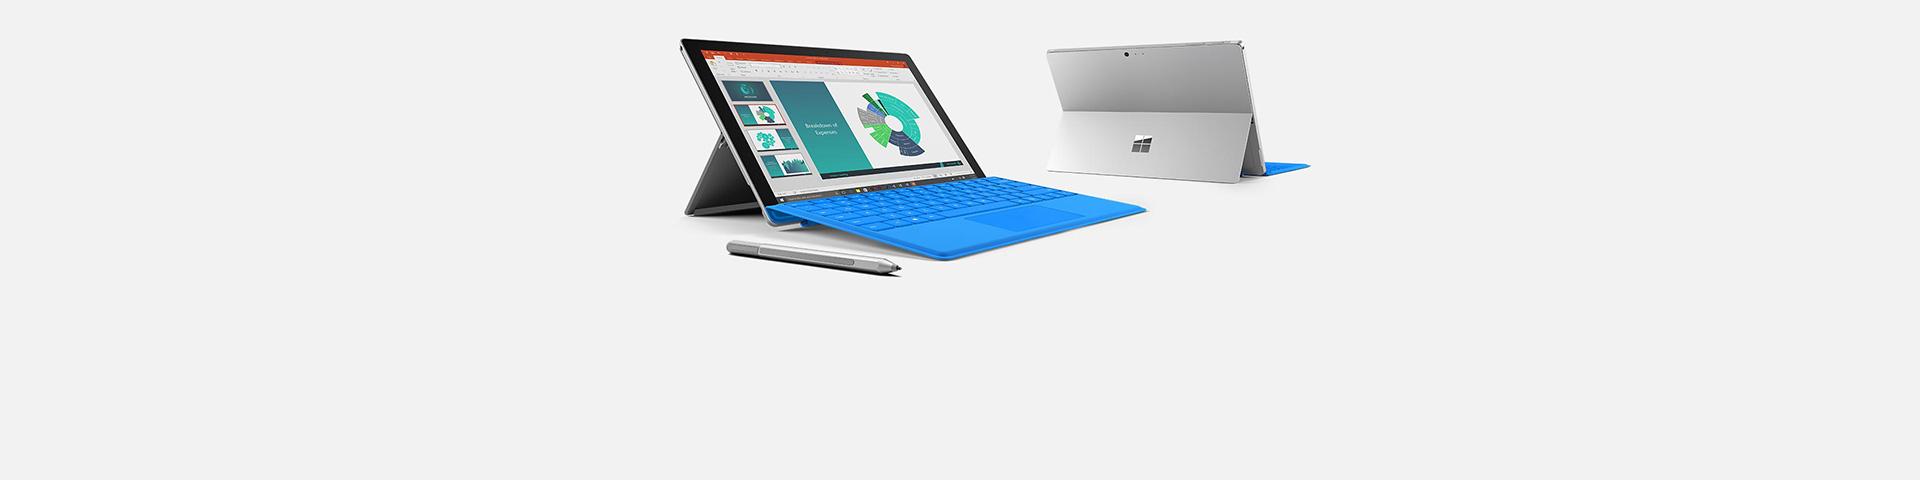 Surface Pro 4-enheter